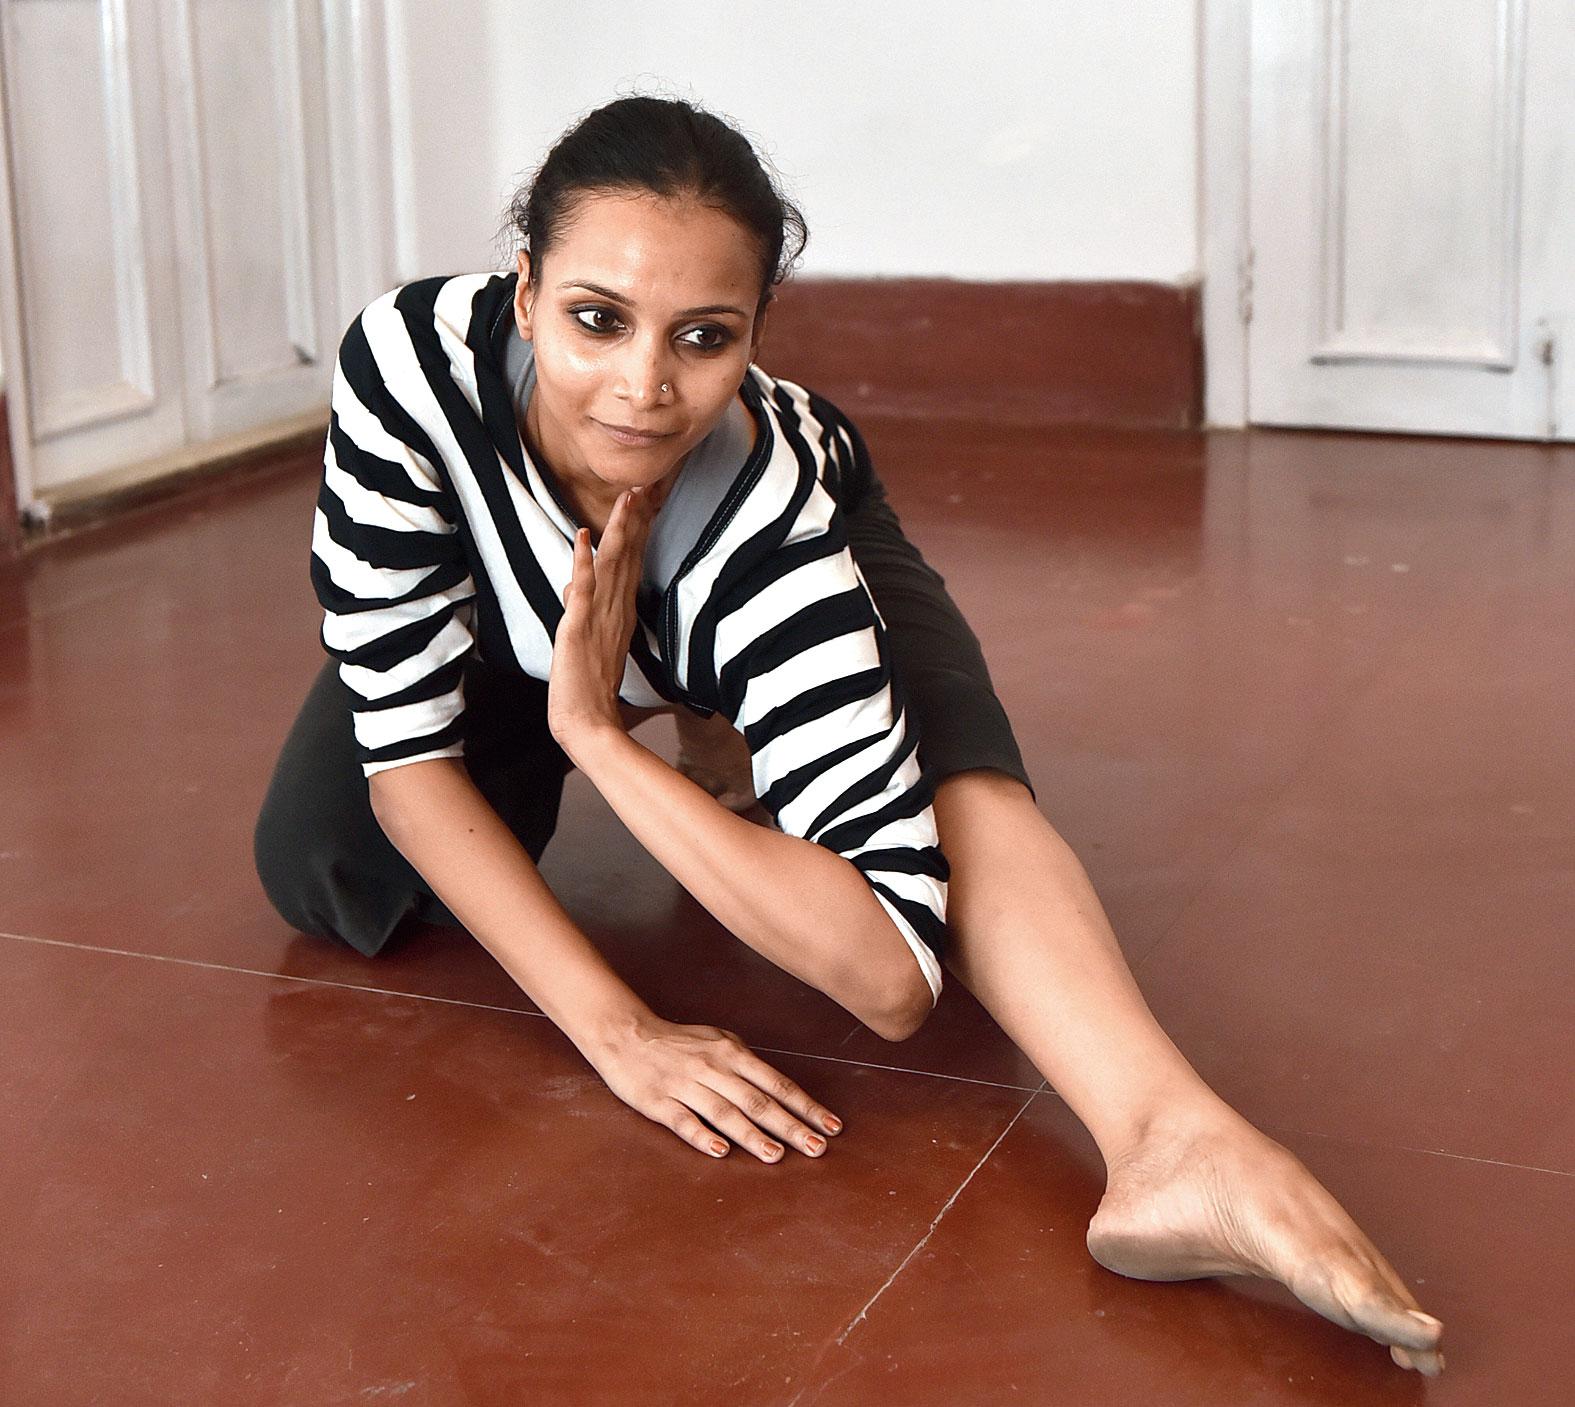 Diya Naidu performs Strange Intimacies